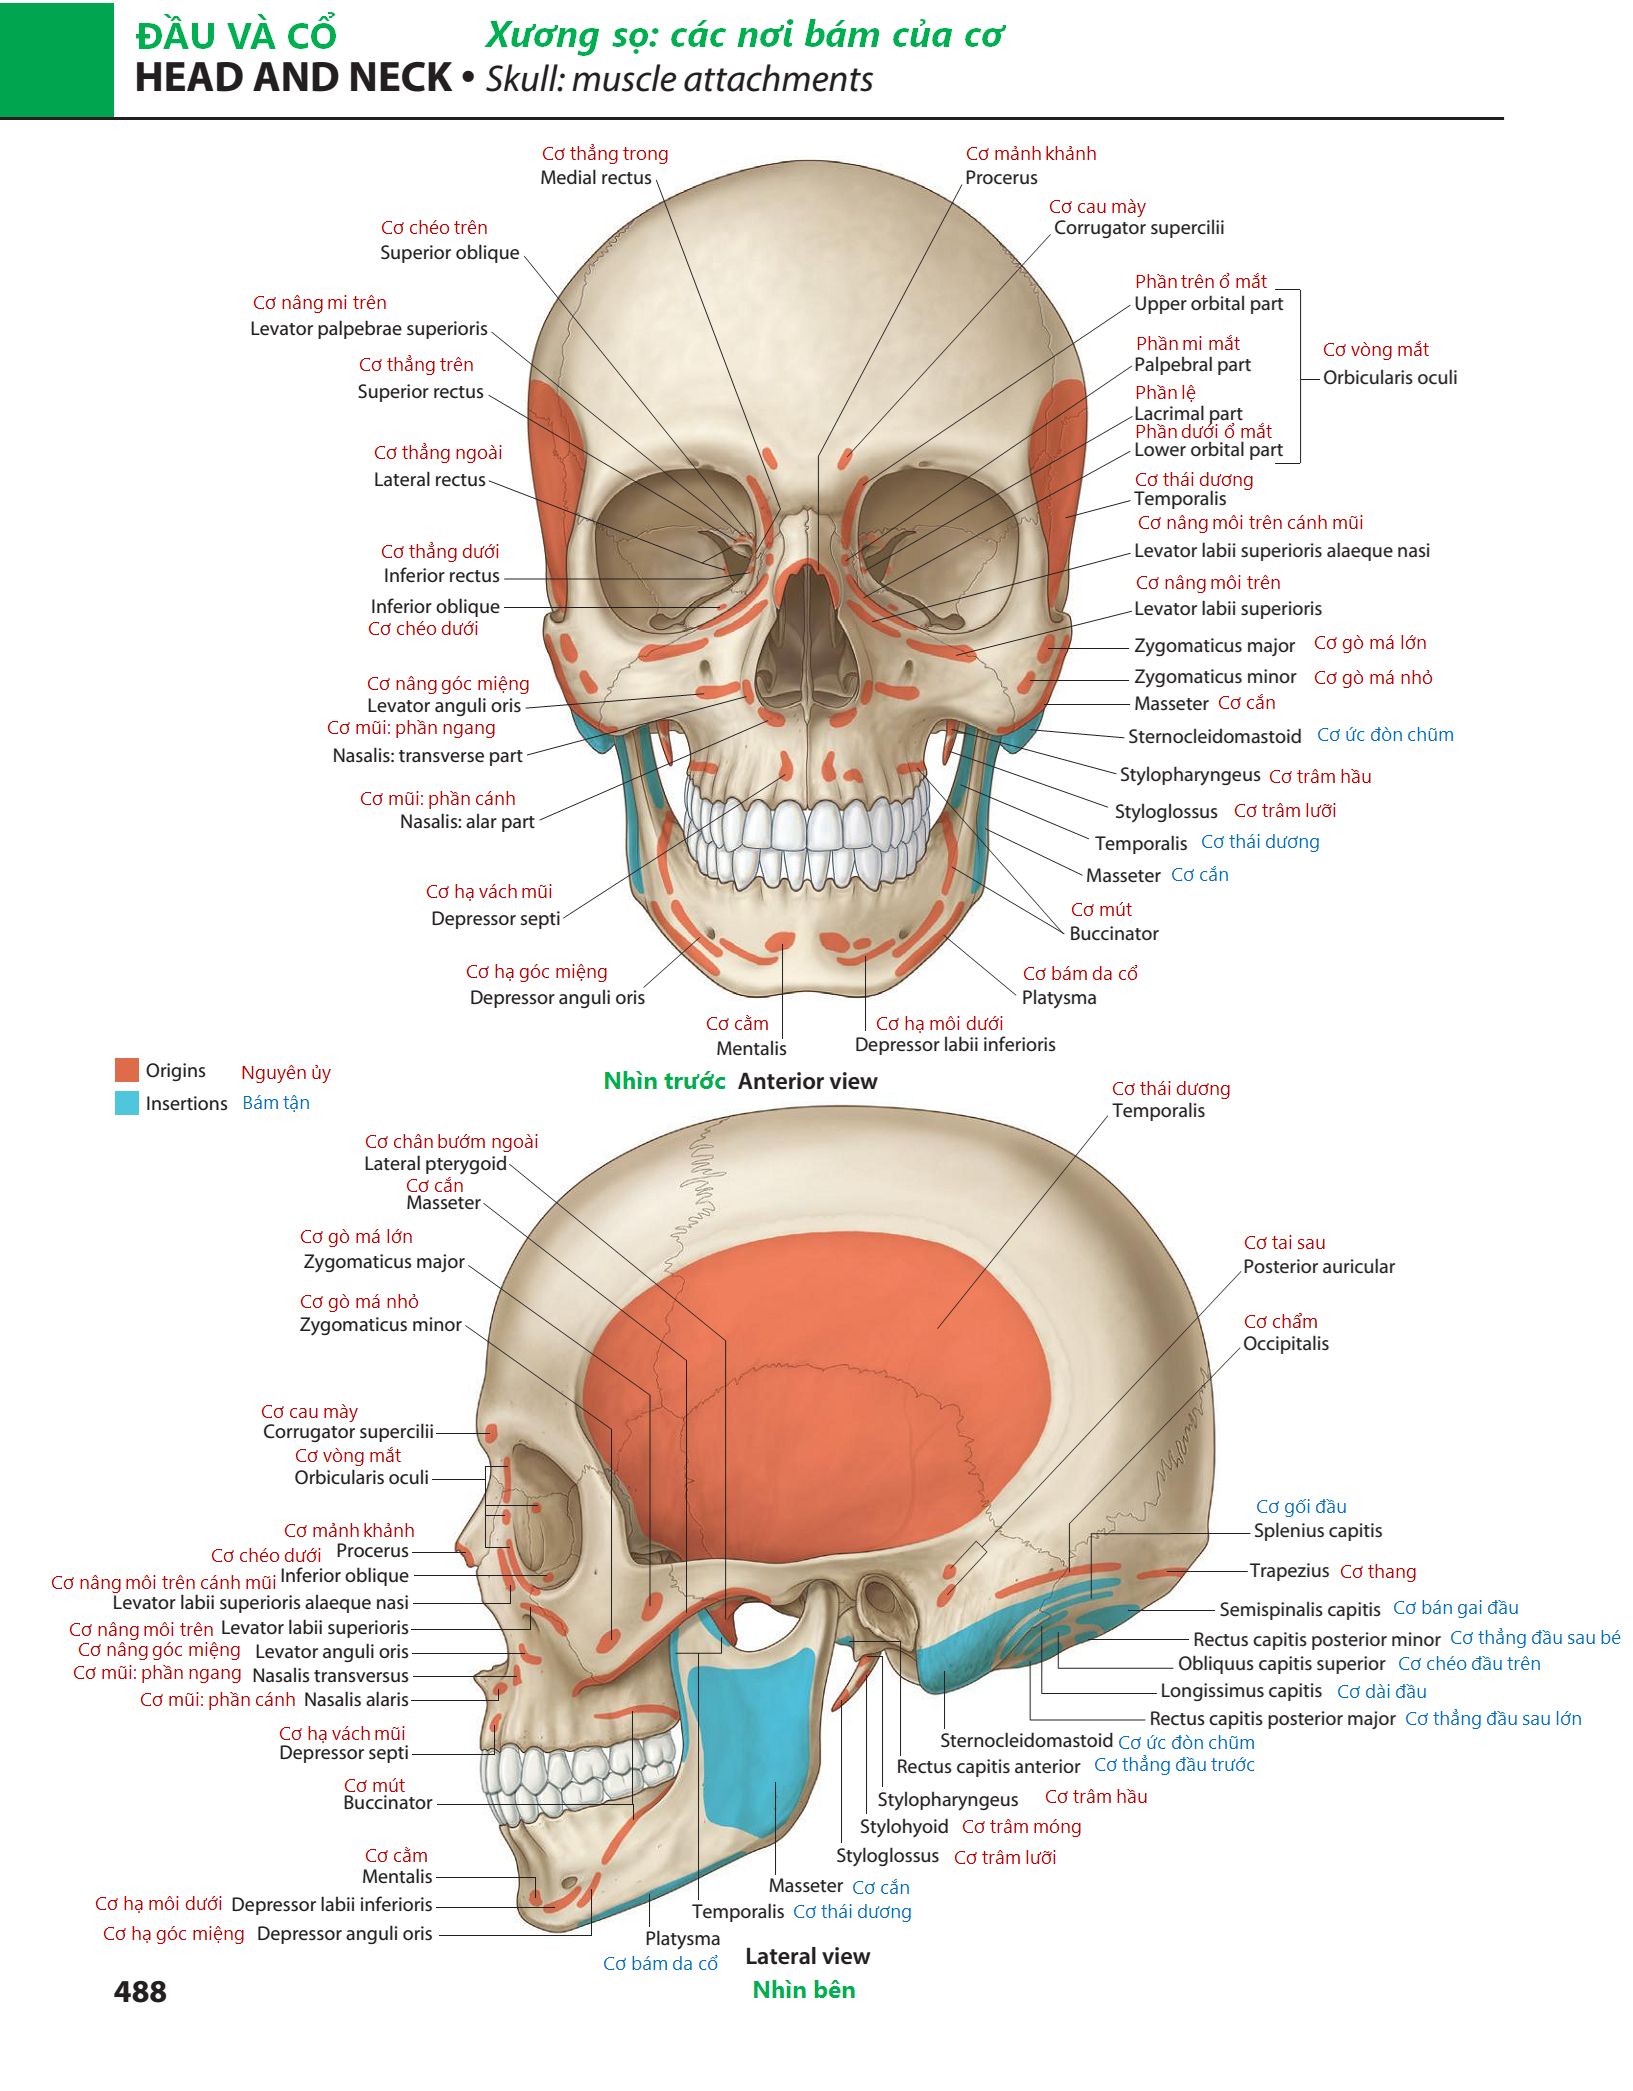 Richard L. Drake, A. Wayne Vogl, Adam W. M. Mitchell, Richard M. Tibbitts & Paul E. Richardson. Gray's Atlas of Anatomy,2nd Edition. Churchill Livingstone, 2015: 488